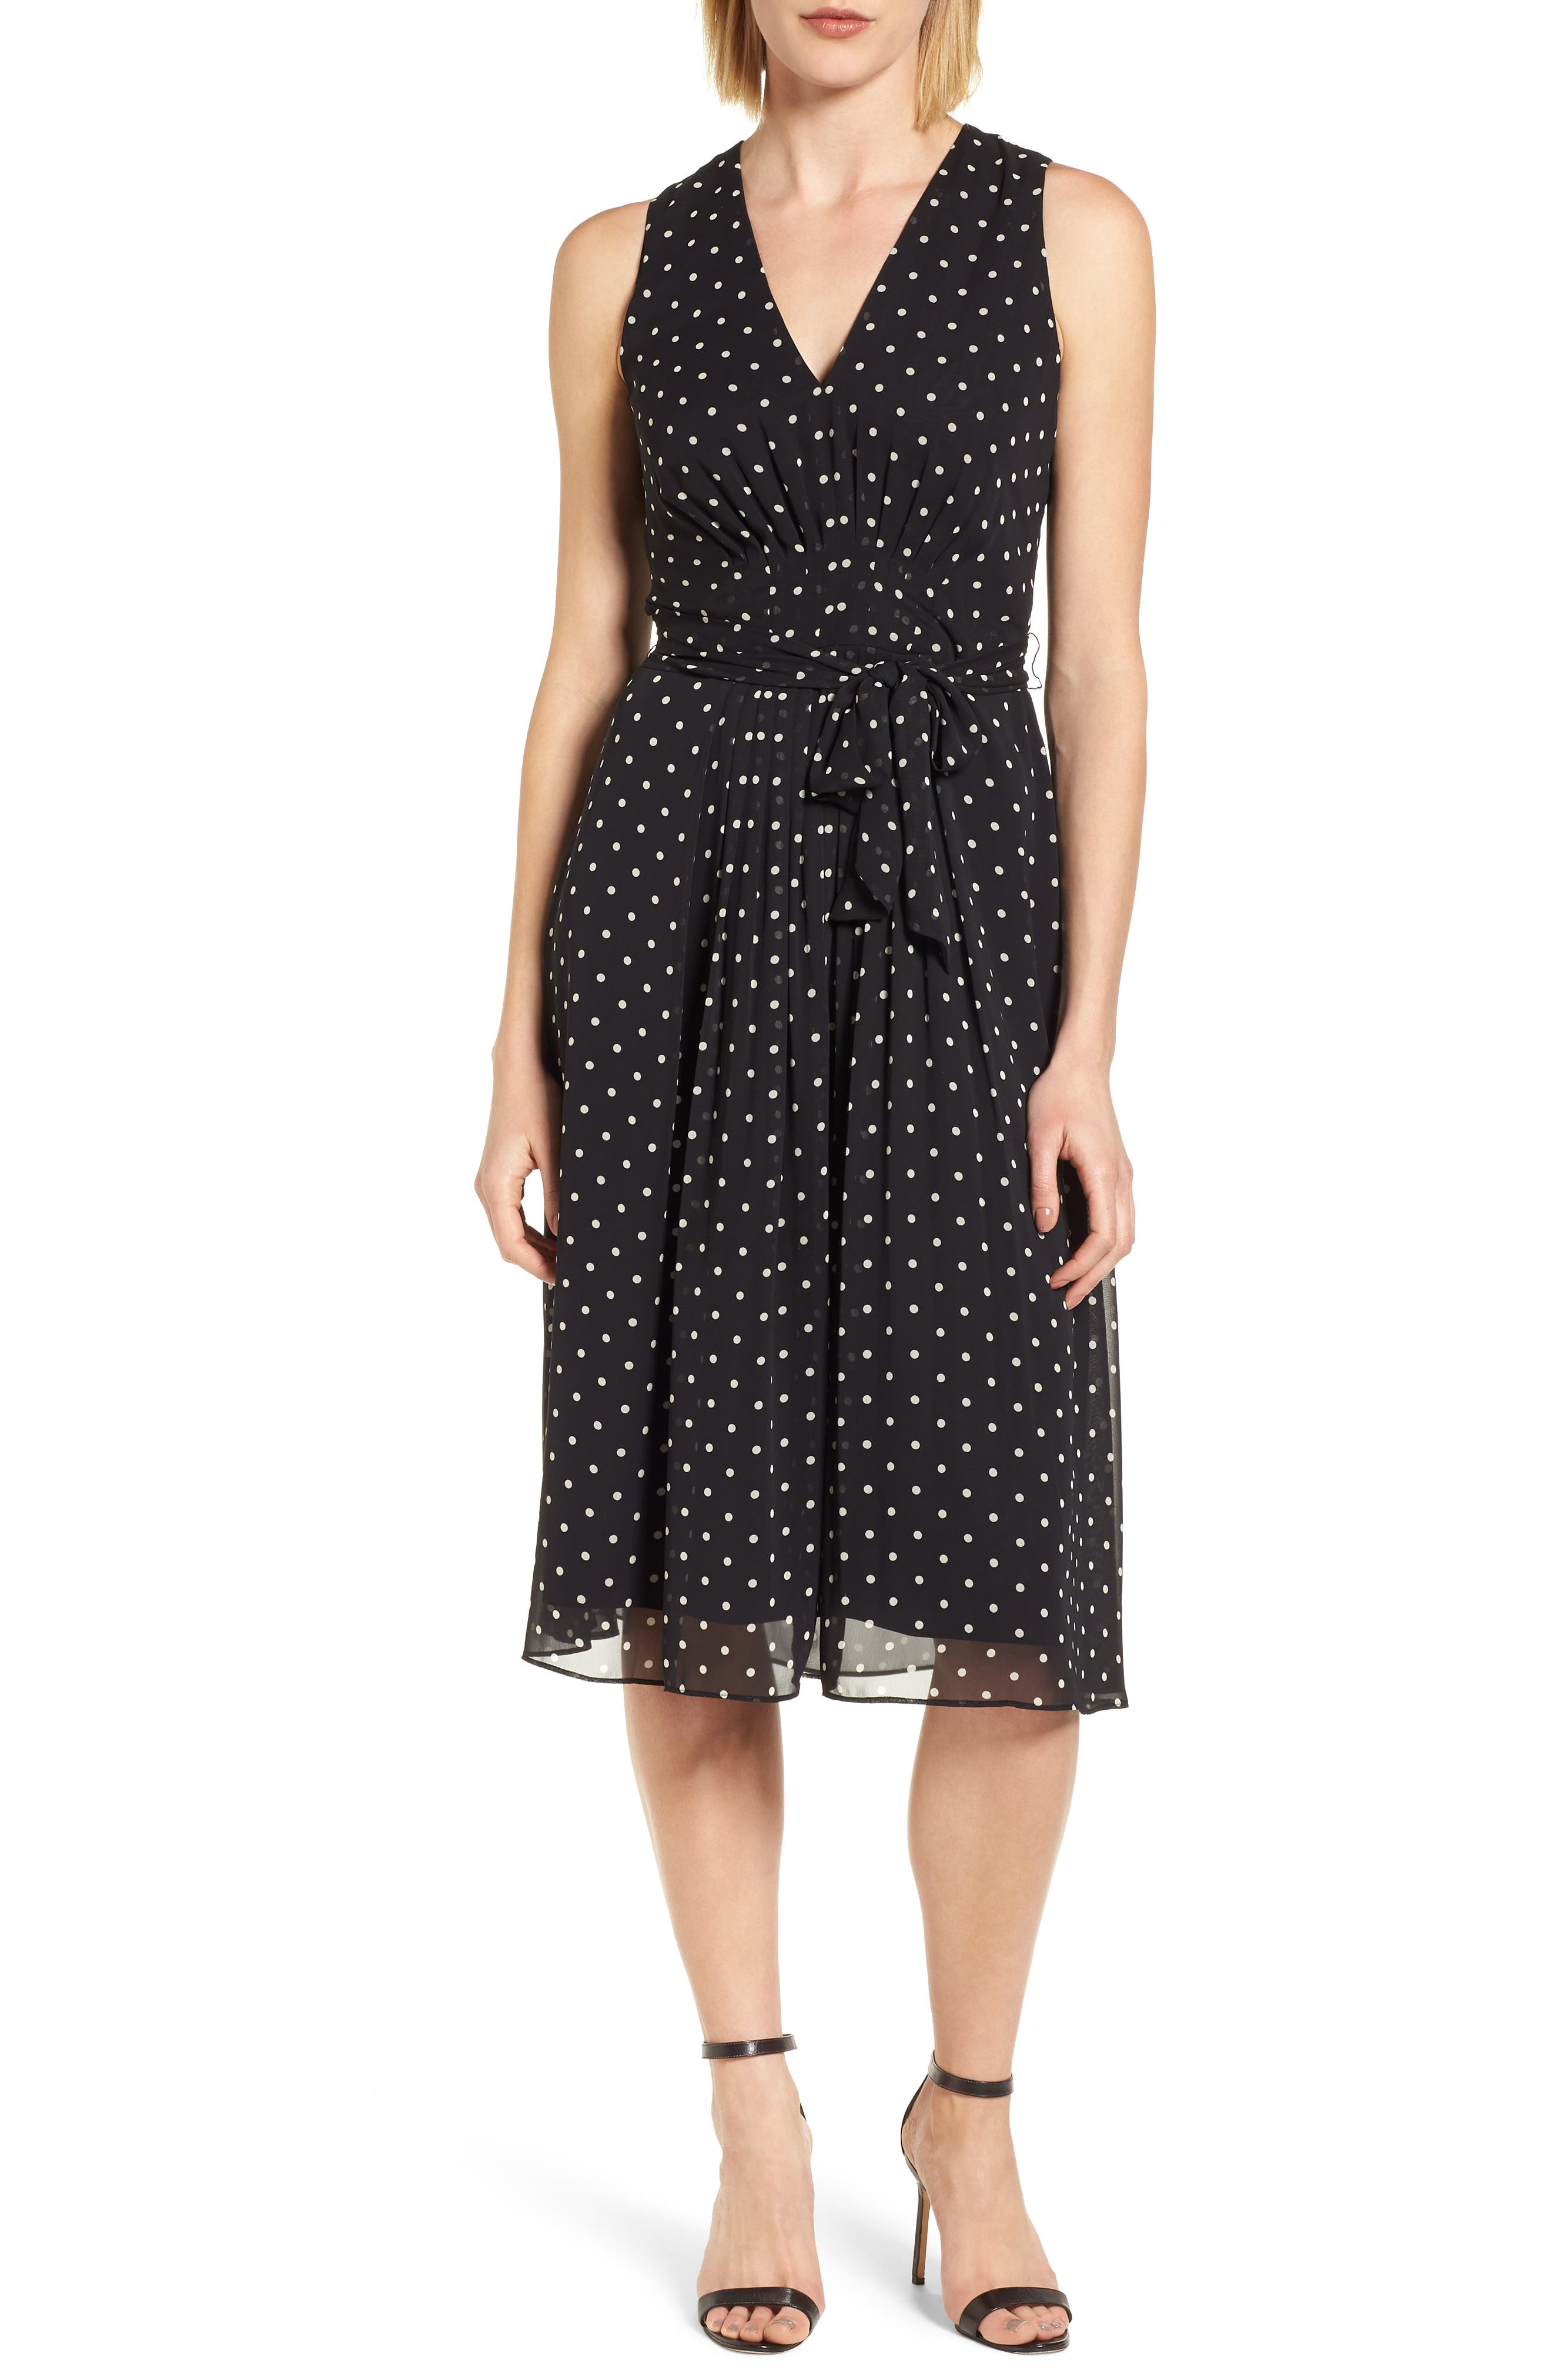 New York Dotted Chiffon Dress,                         Main,                         color, Black/ White